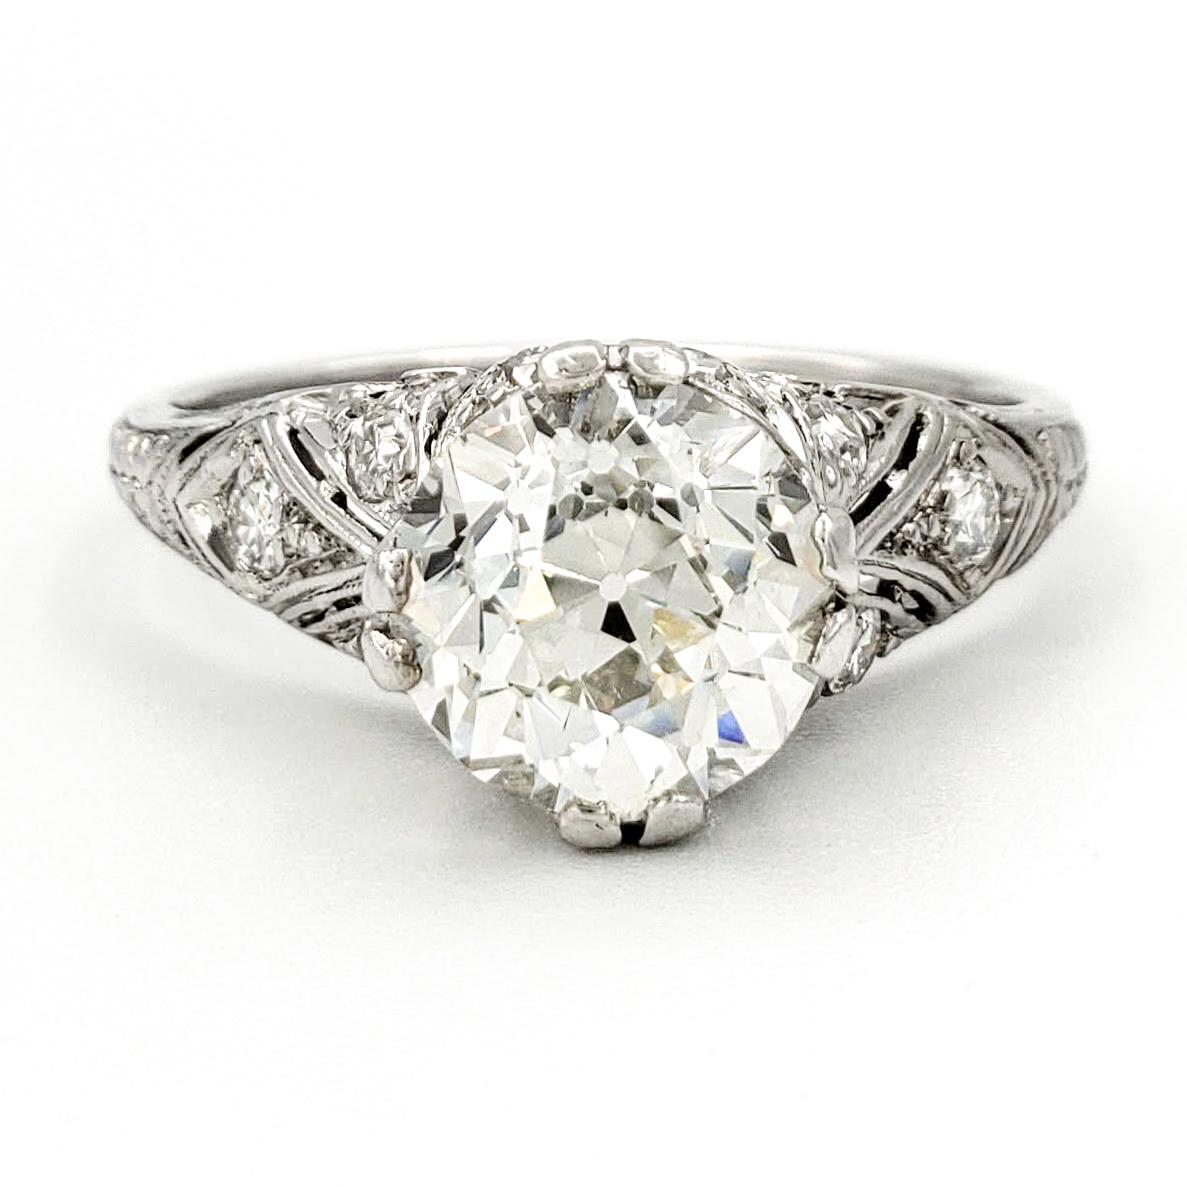 vintage-platinum-engagement-ring-with-1-99-carat-old-european-cut-diamond-egl-h-vs2